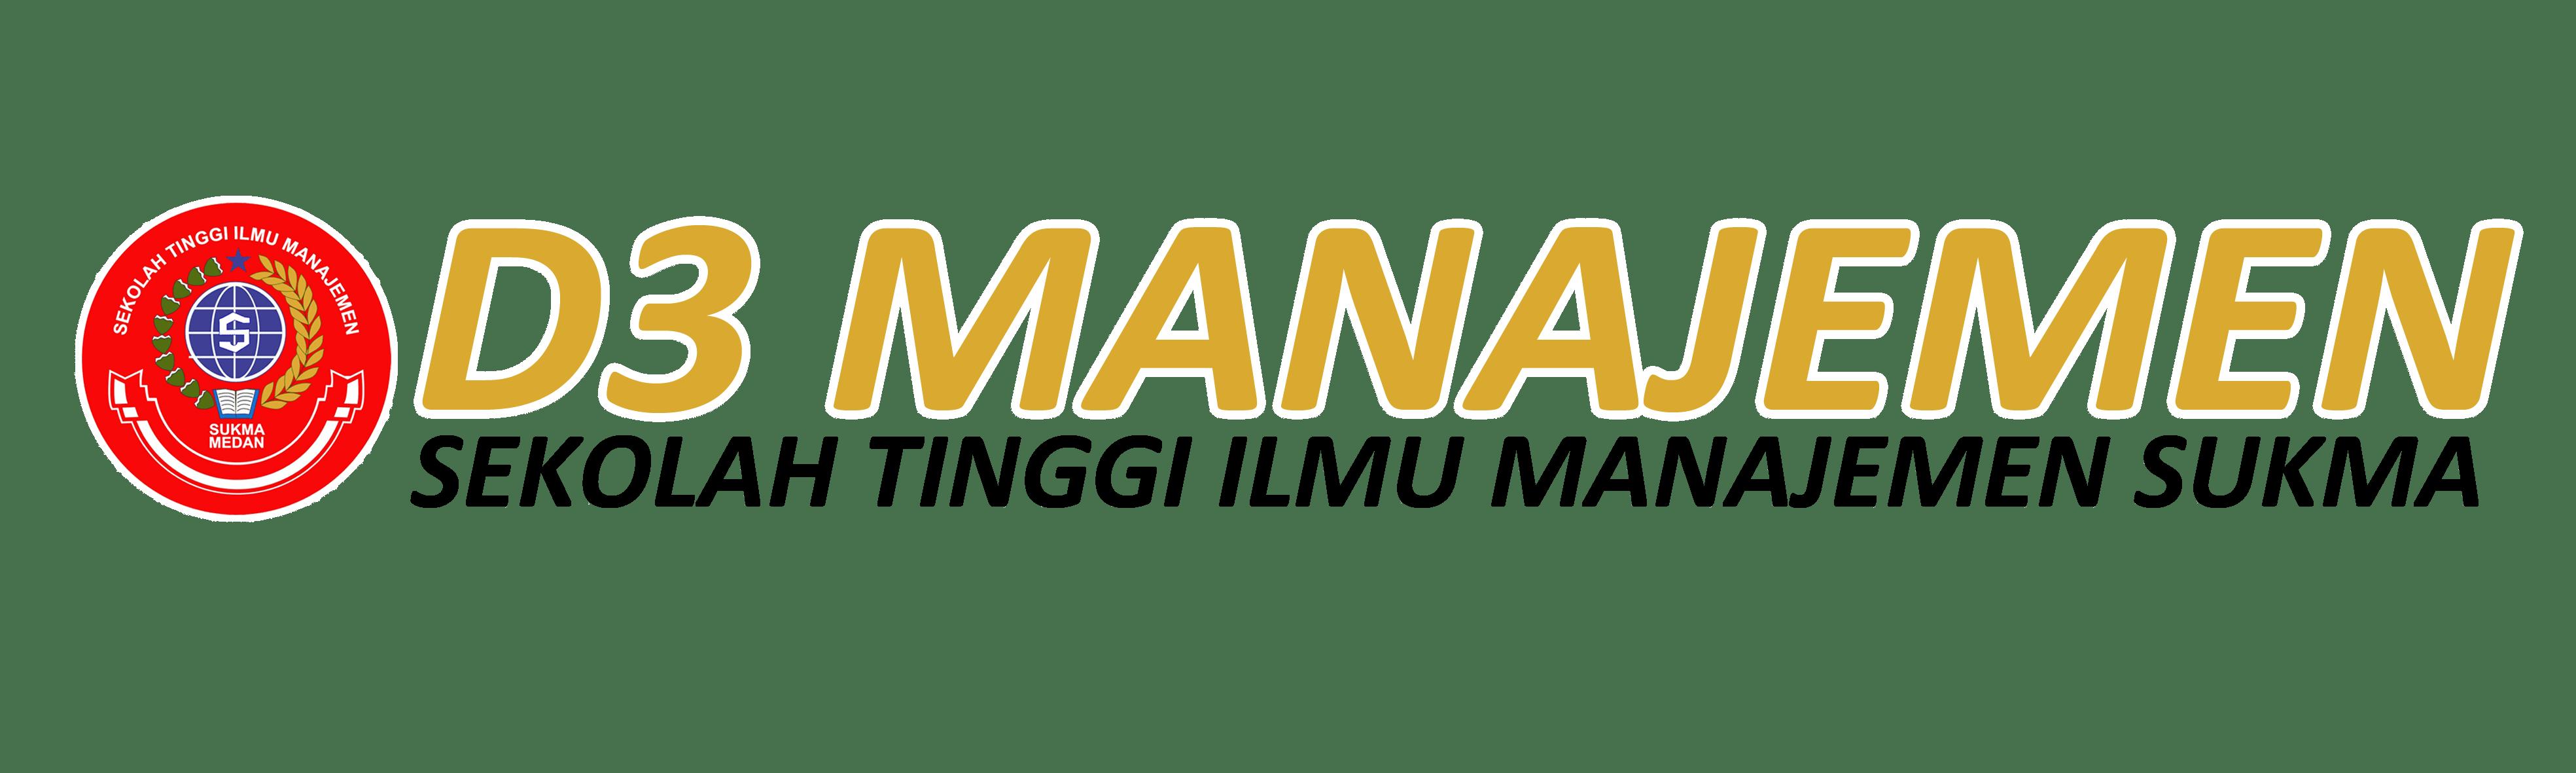 D3 Manajemen STIM SUKMA MEDAN